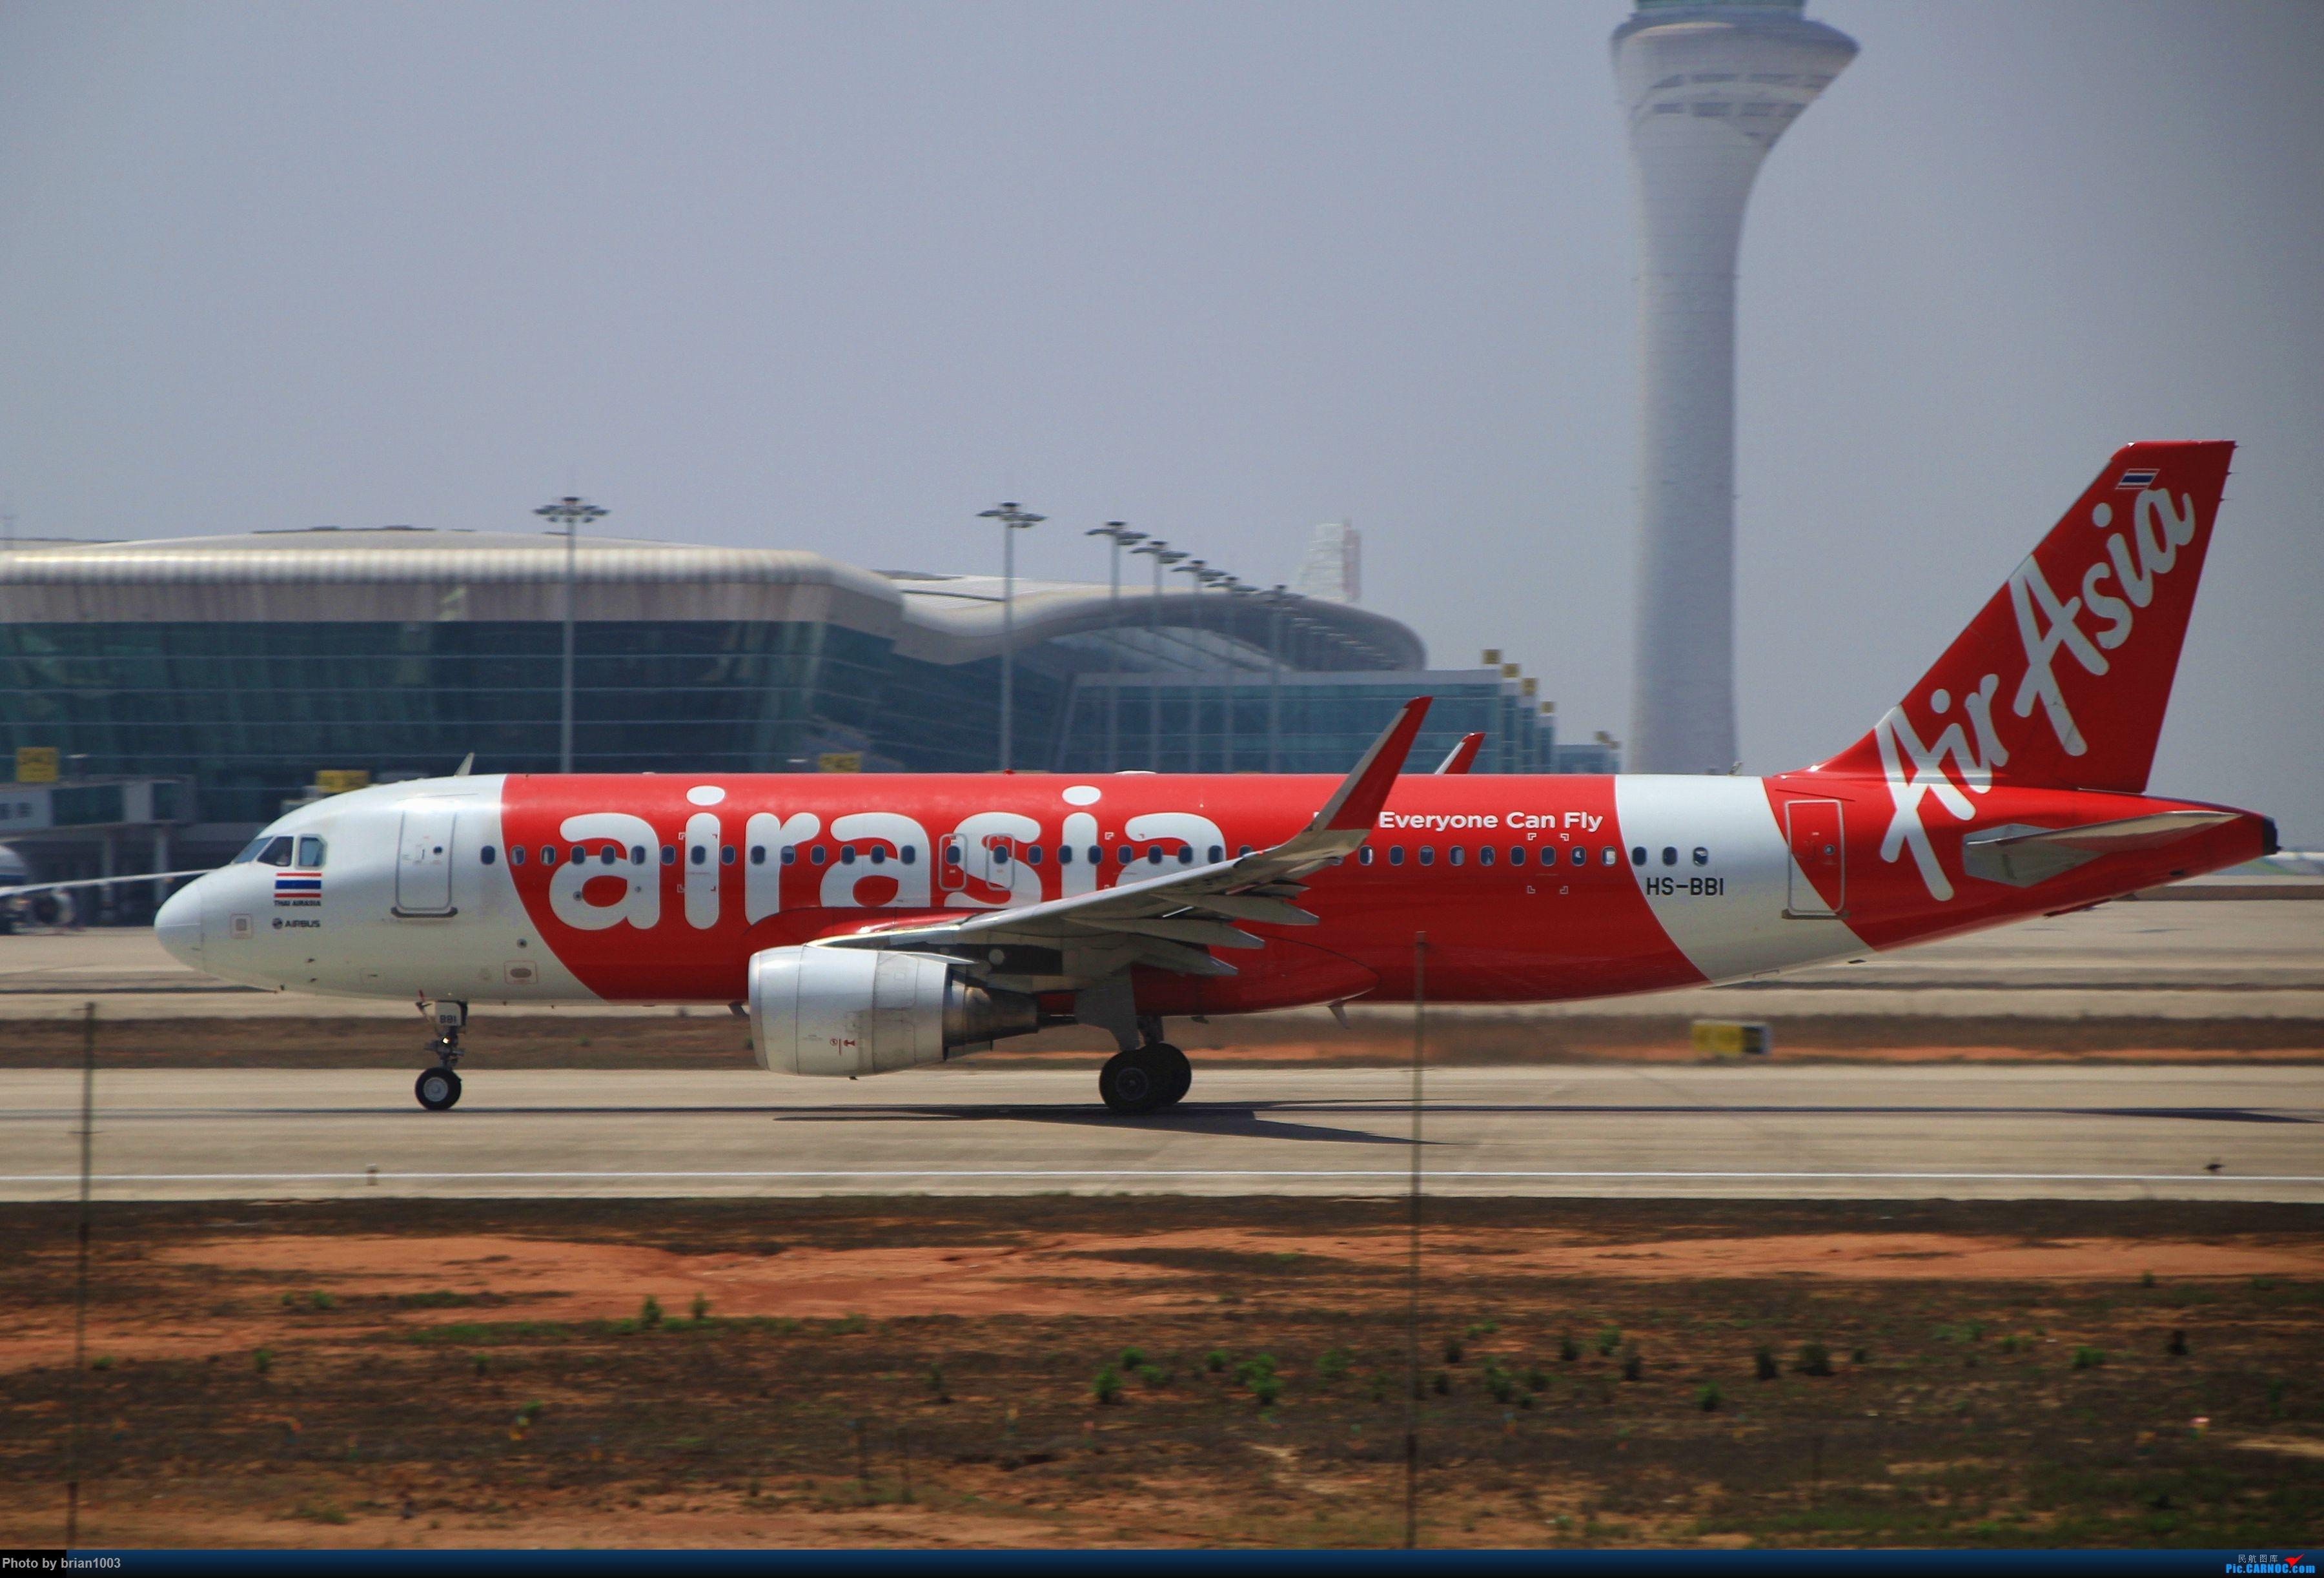 Re:[原创]WUH武汉天河机场拍机之喜迎酷航788和偶遇某其他飞机 AIRBUS A320 HS-BBI